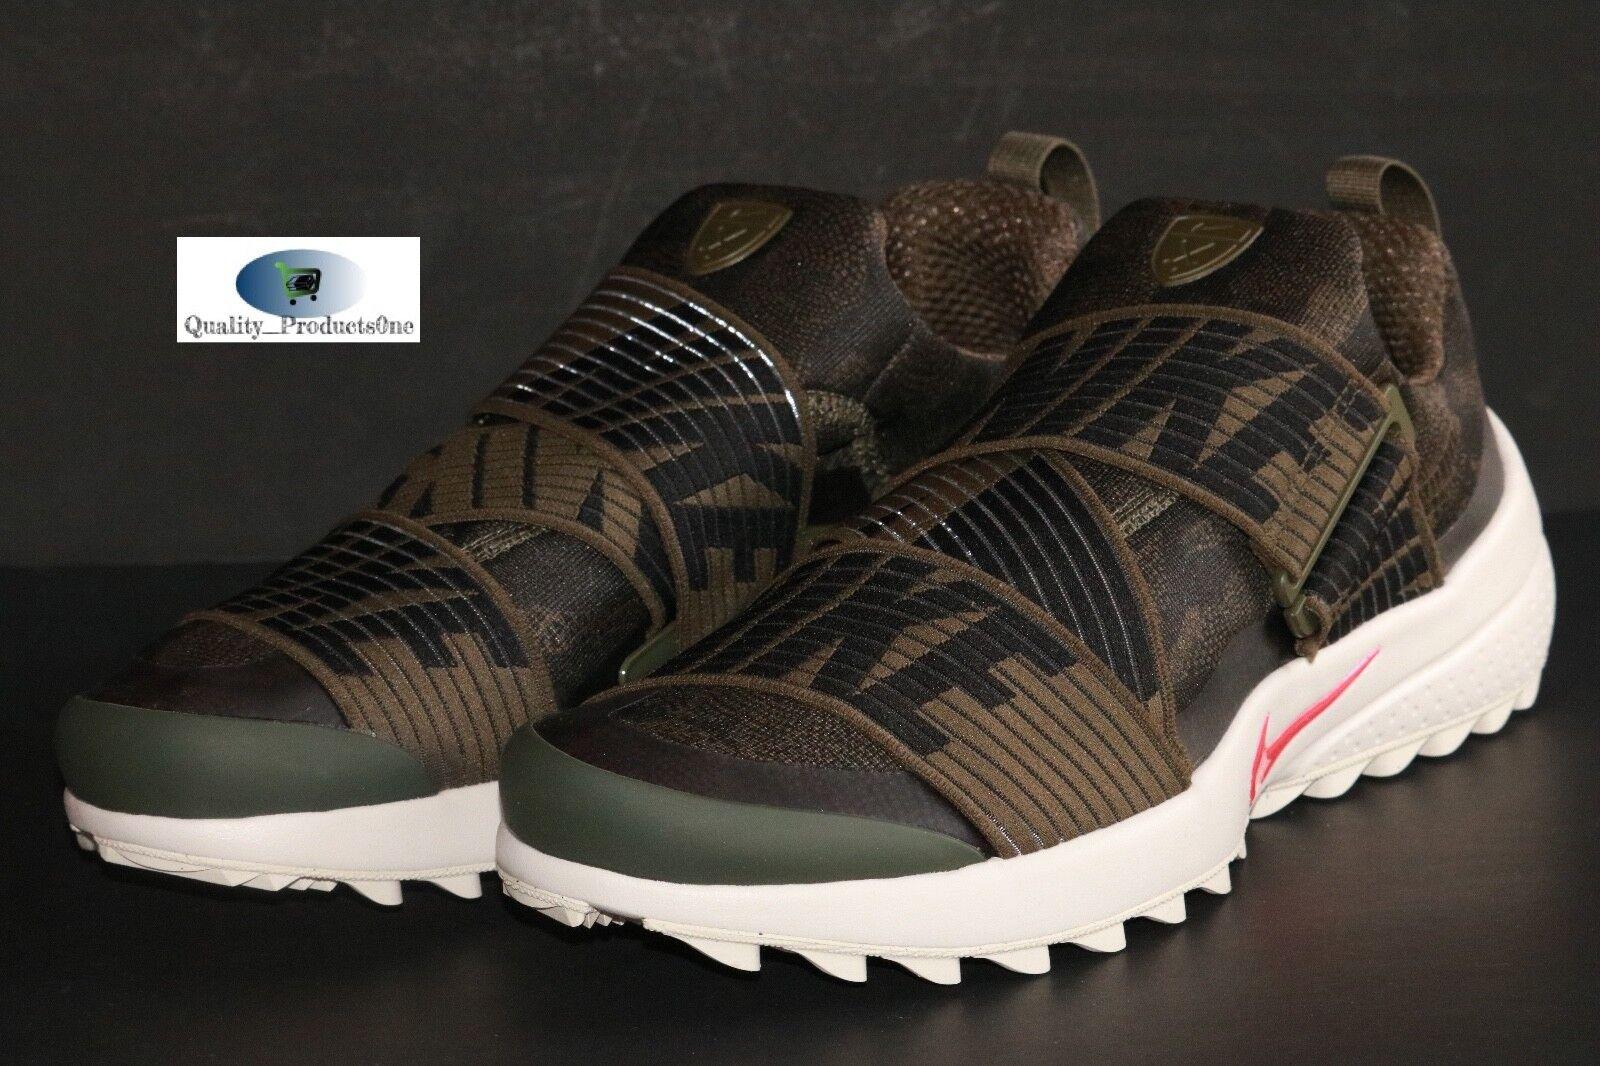 Mens Nike Air Zoom GIMME Cargo Khaki/Black-Light Bone 849955 301 Sz 11